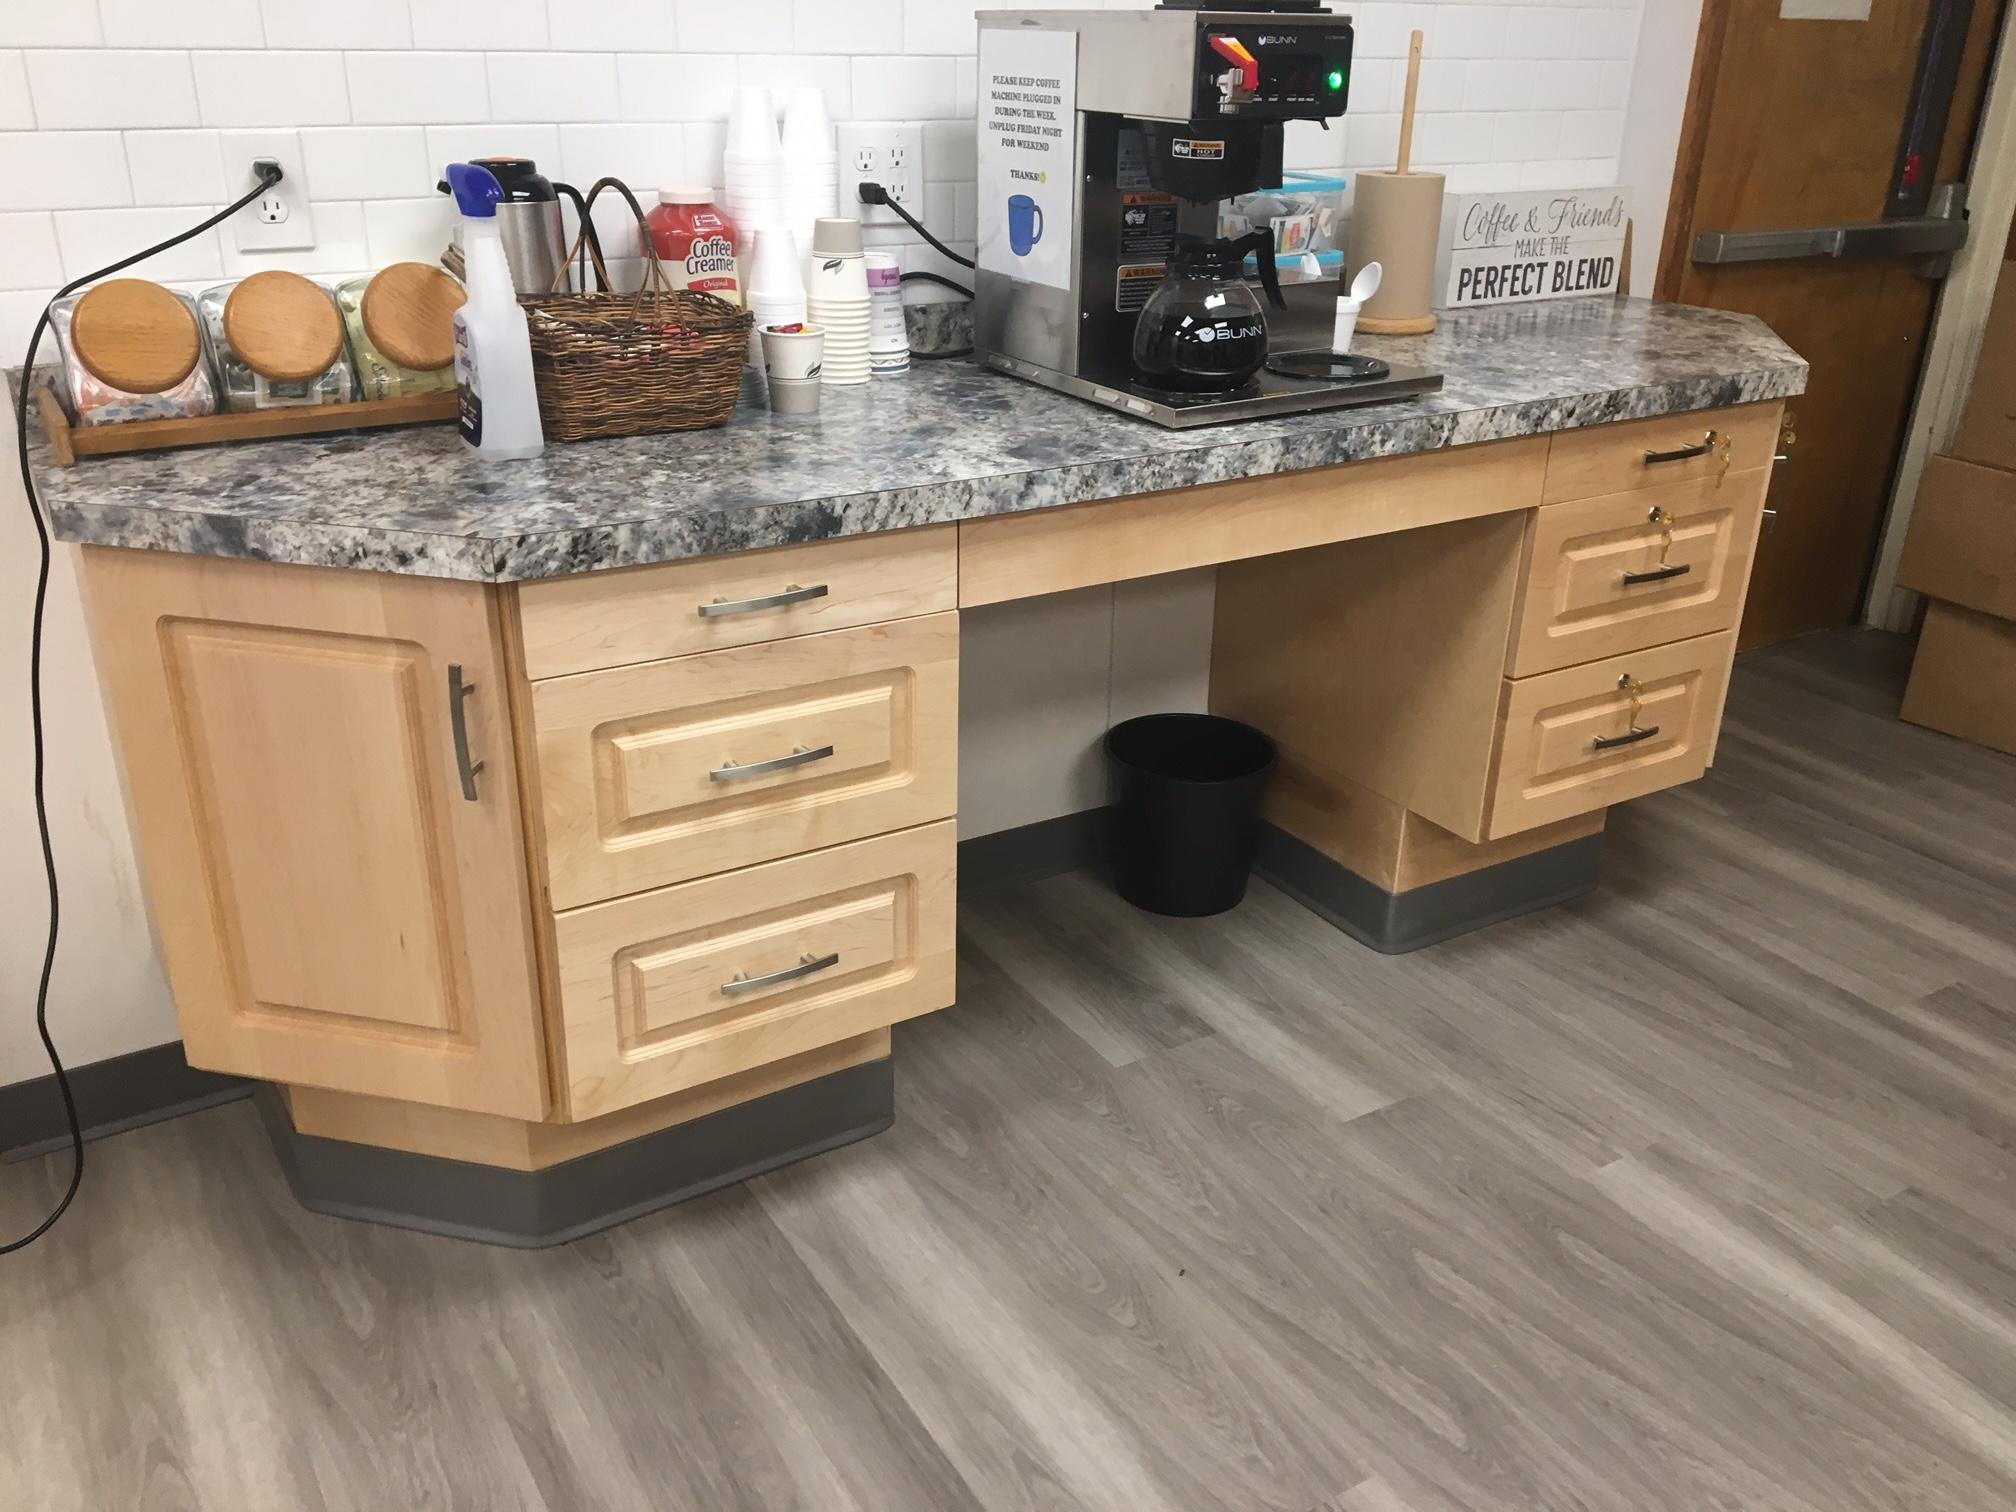 Wilmington Senior Center - Coffee Station